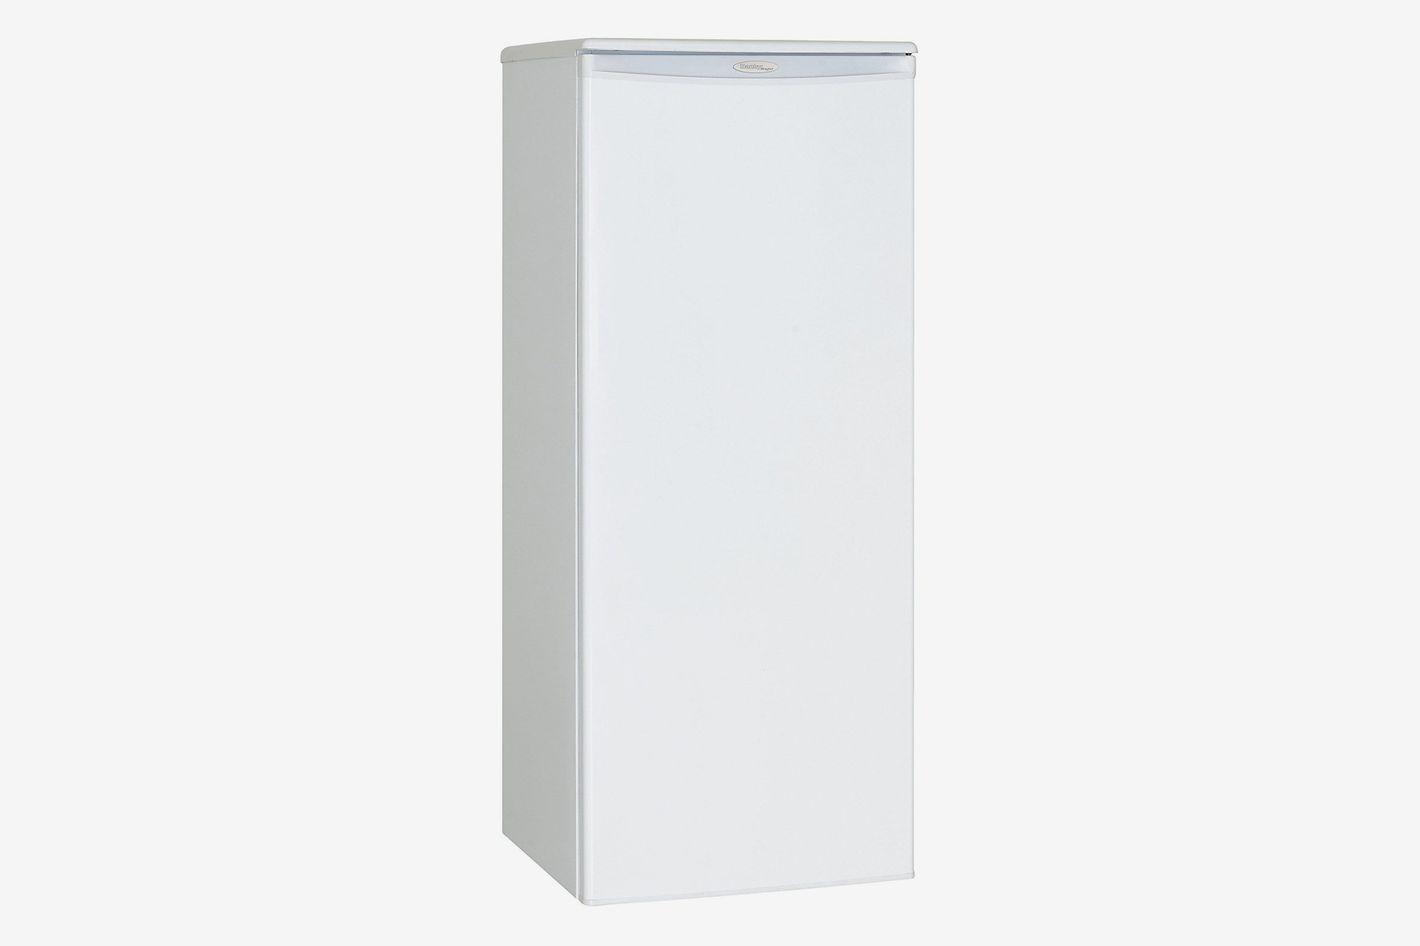 Danby 8.5 Cubic Feet Upright Freezer